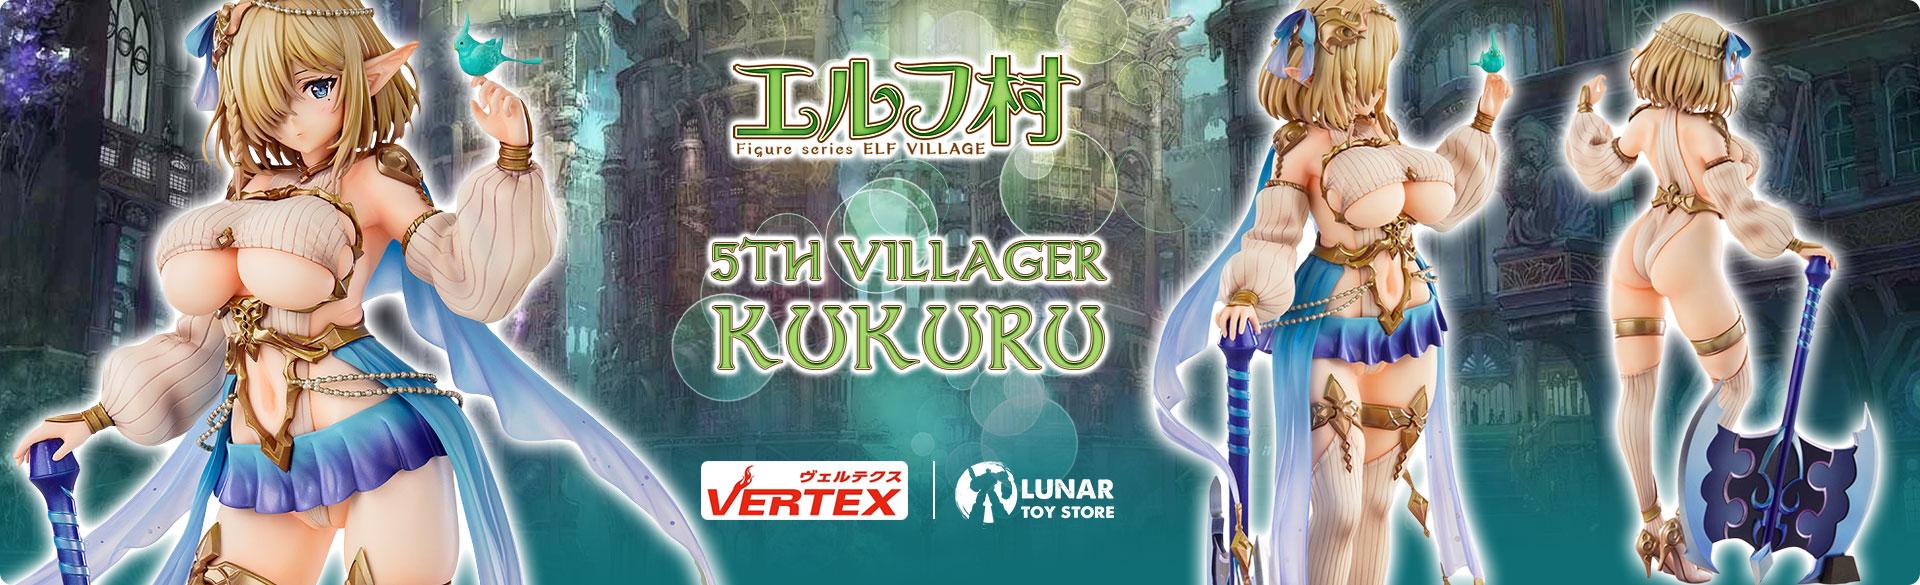 5th Villager Kukuru